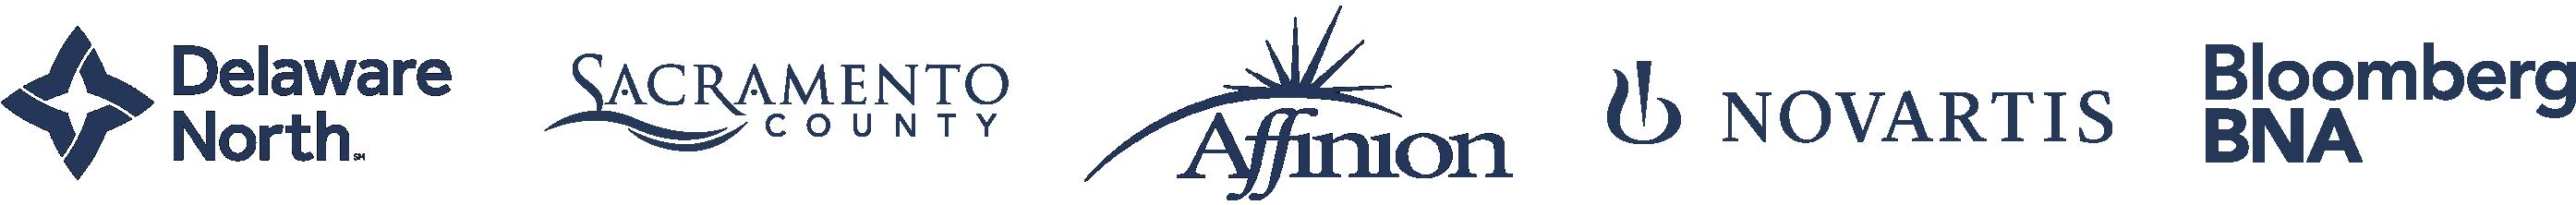 Faixa do logotipo da Delaware North, do Sacramento County, da Affinion, da Novartis e da Bloomberg BNA